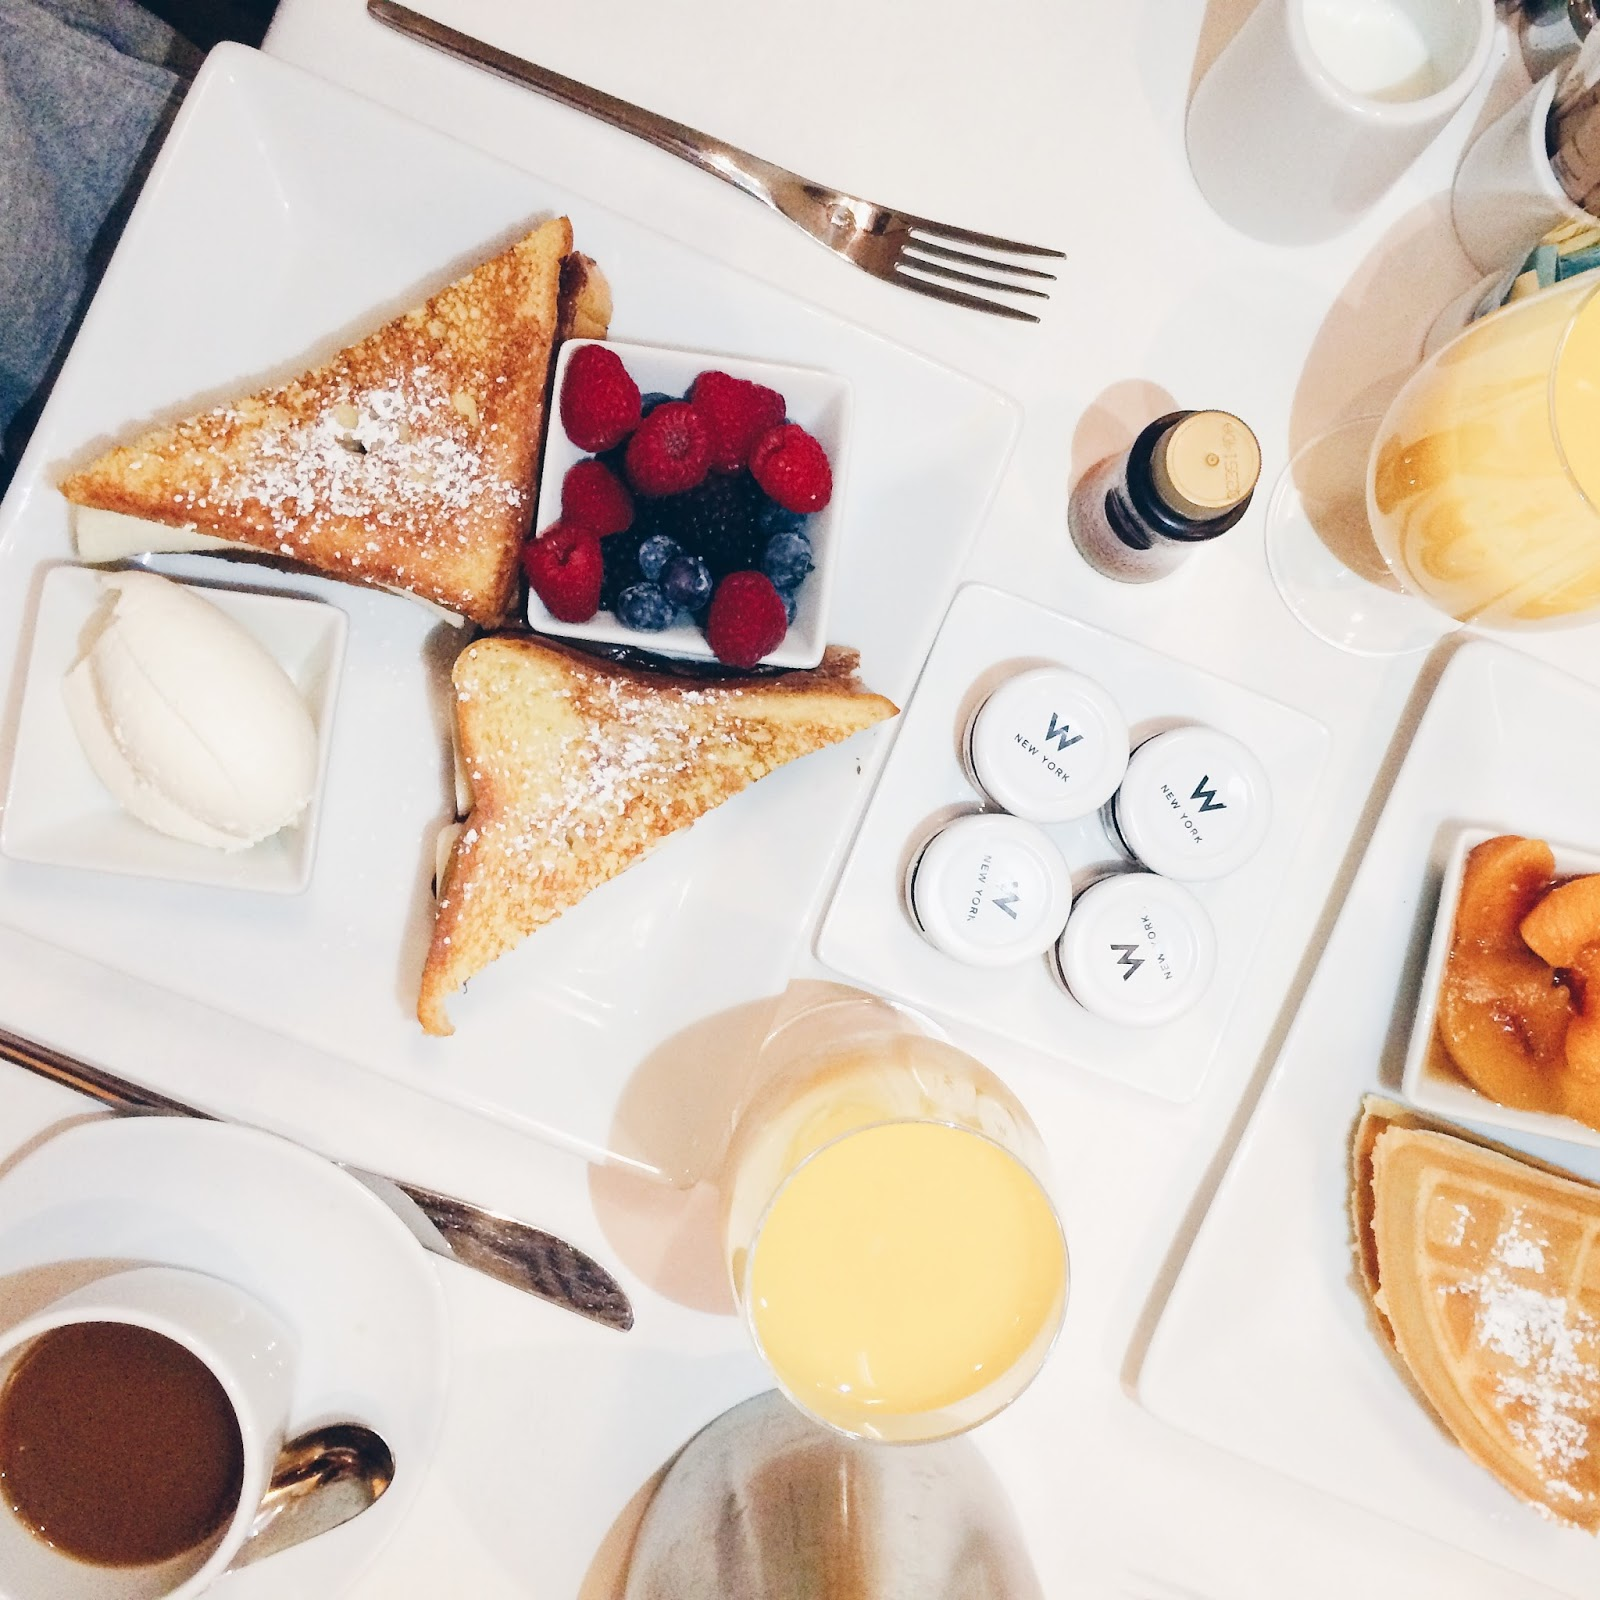 w-hotels-nyc-continental-breakfast.JPG